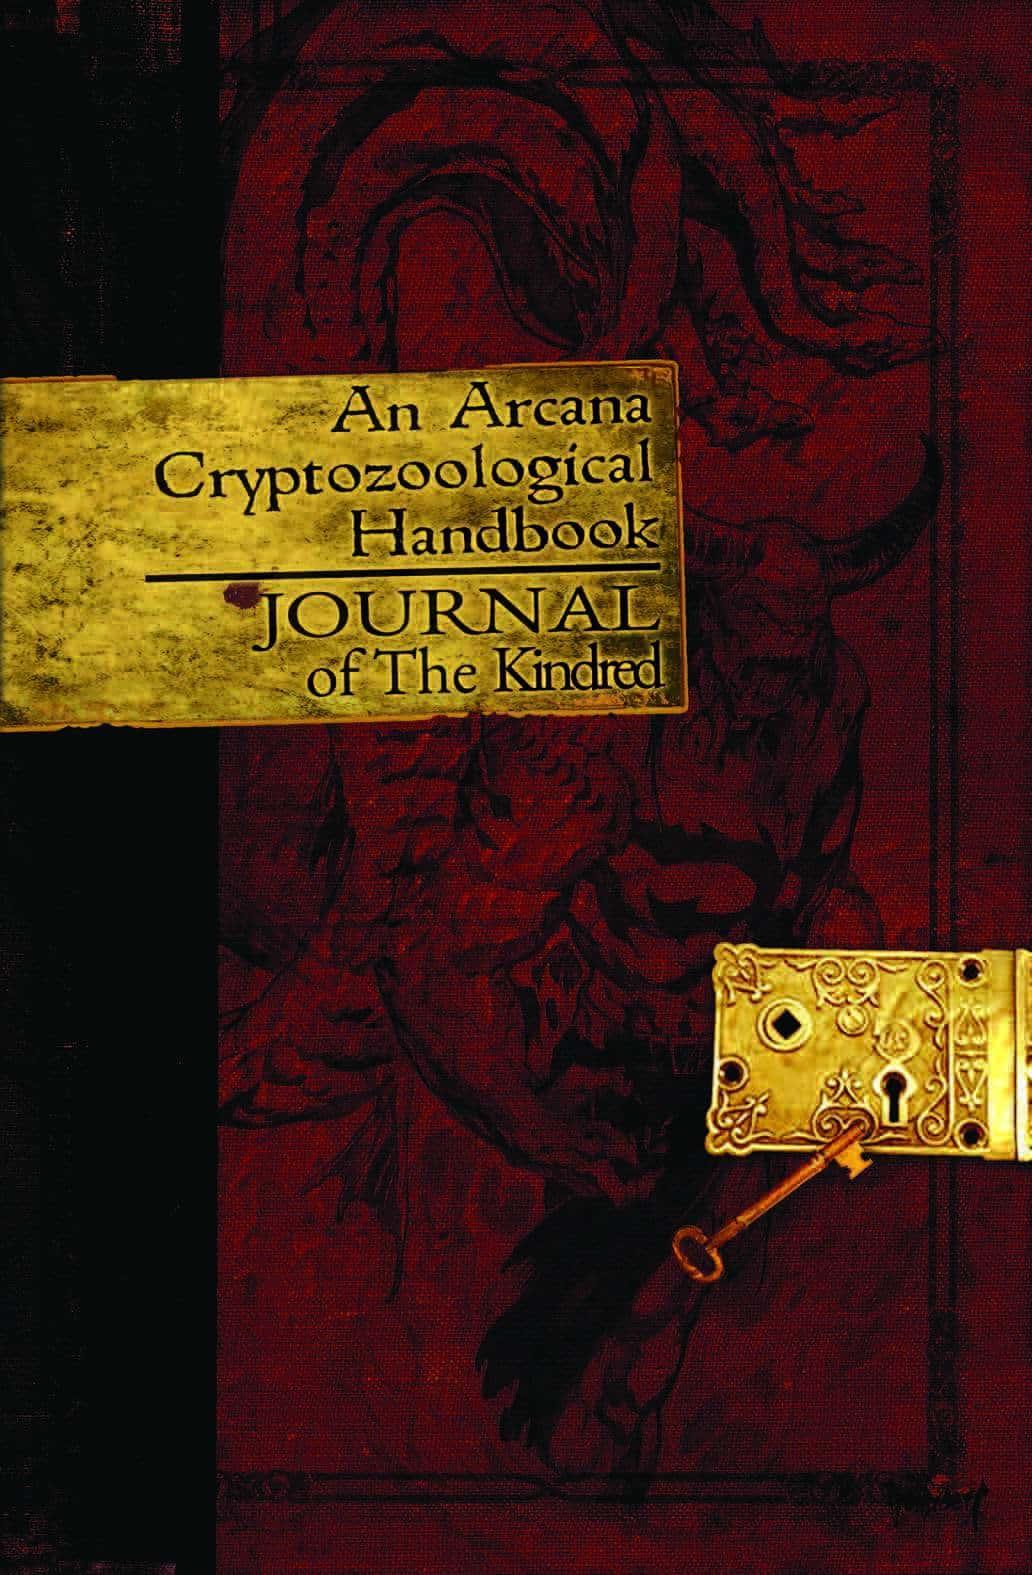 An Arcana Cryptozoology Handbook: Journal of the Kindred 2